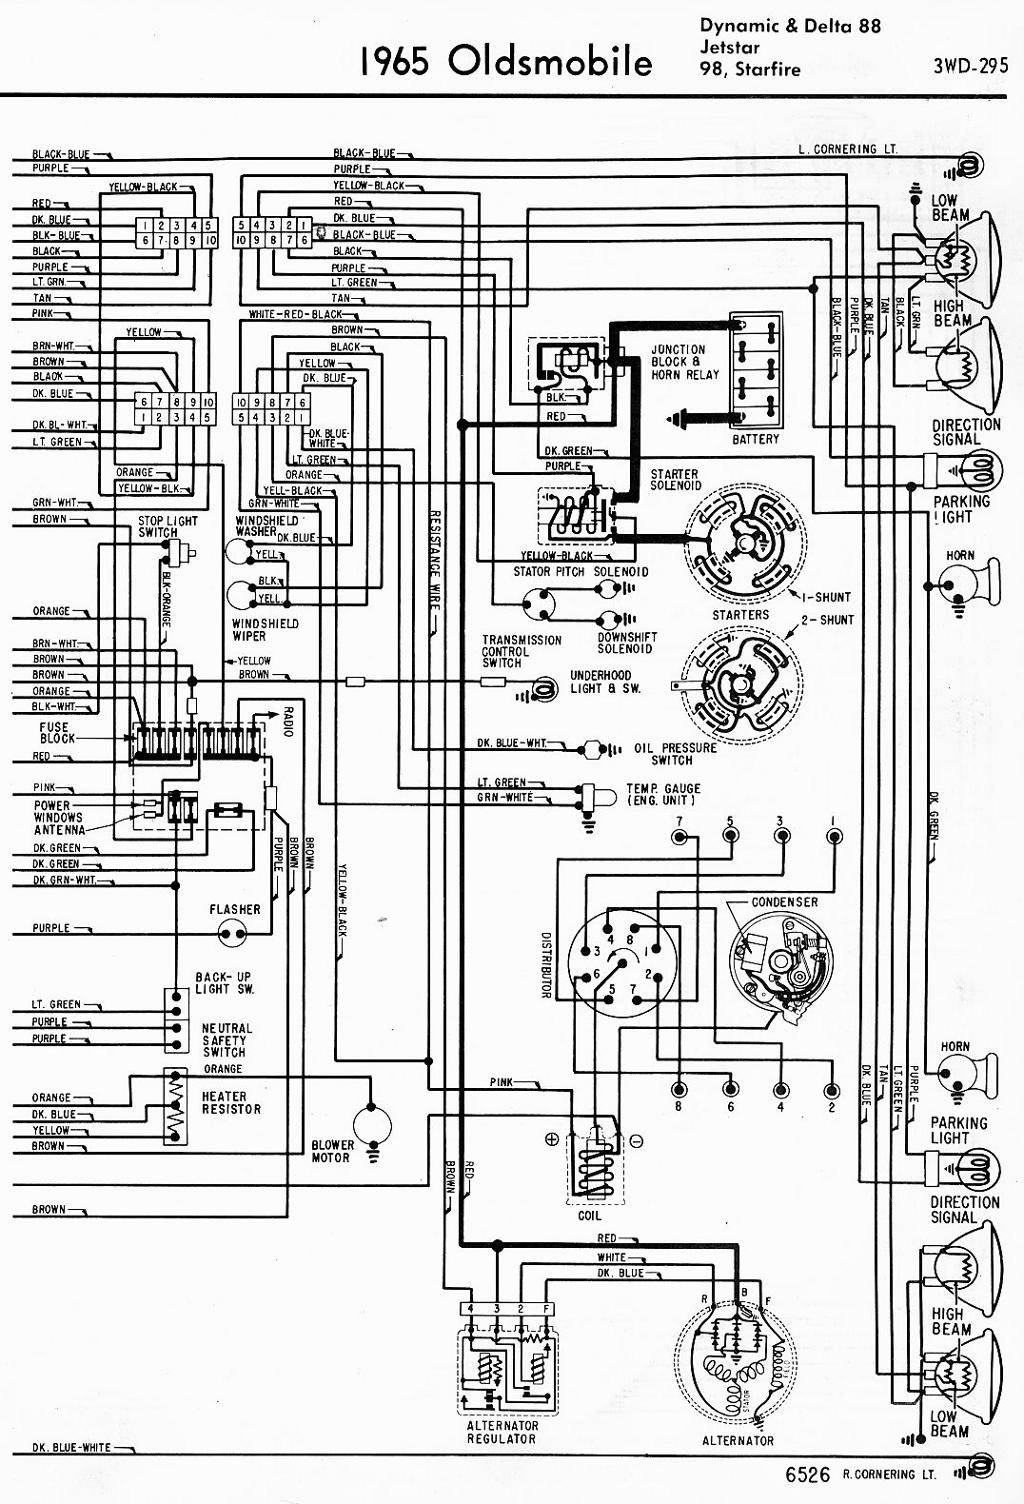 Snap Nissan Primera Fuse Box Diagram And Wiring 2013 Buick Verano Serena Location Temp Sensor Odicis